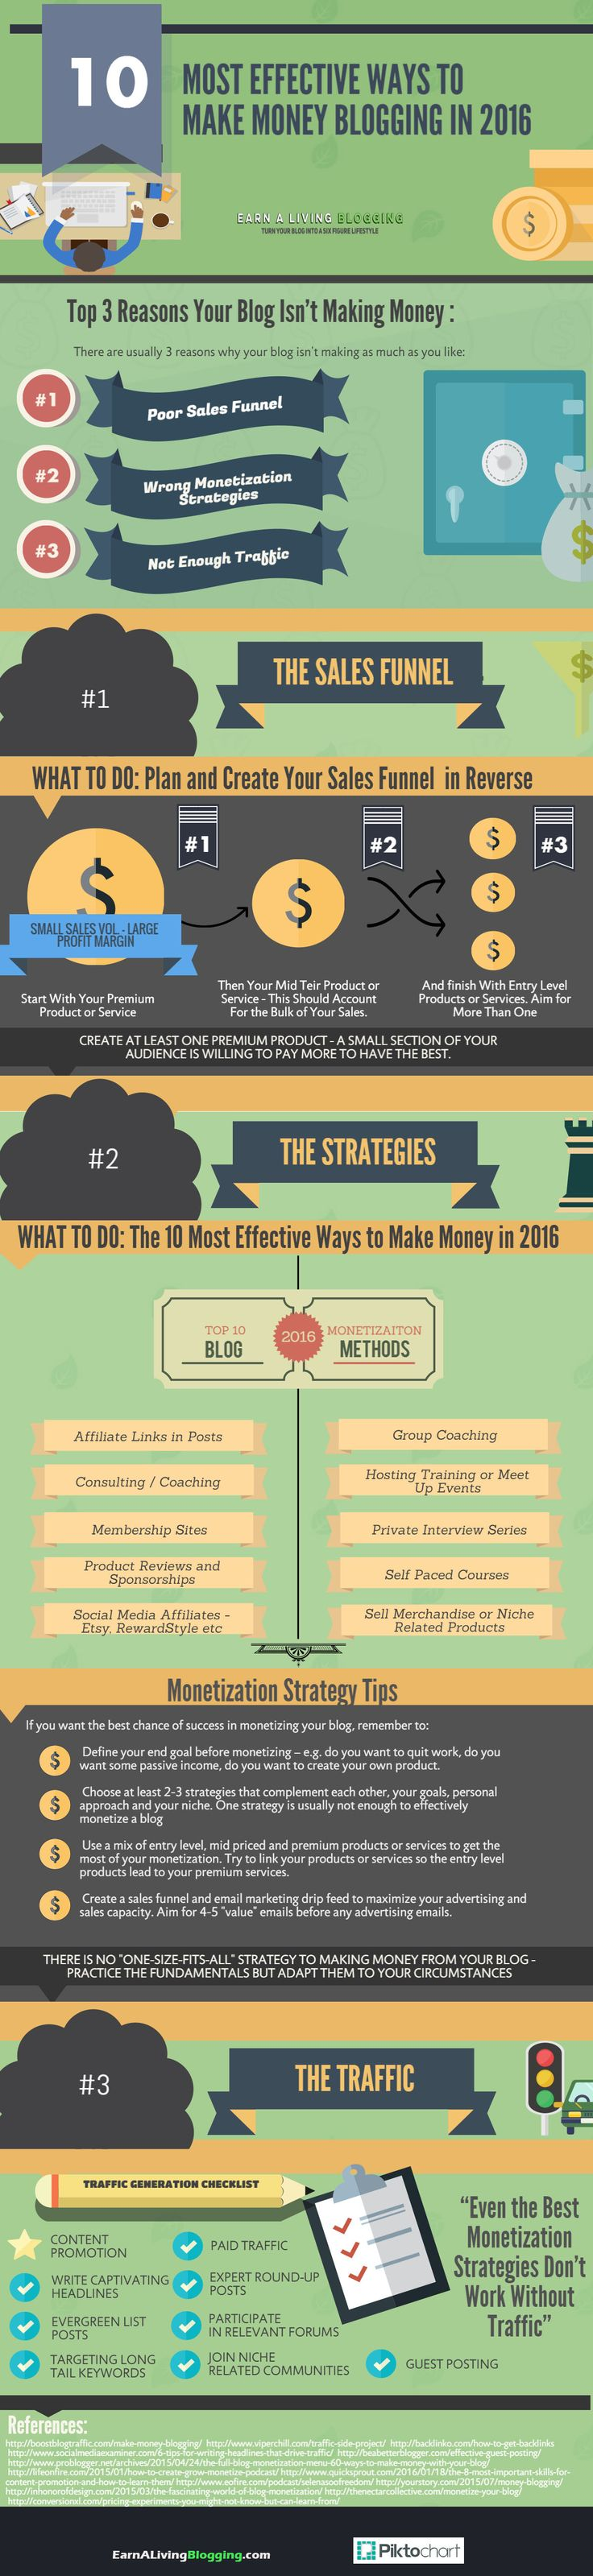 How to Make Money Blogging 2016